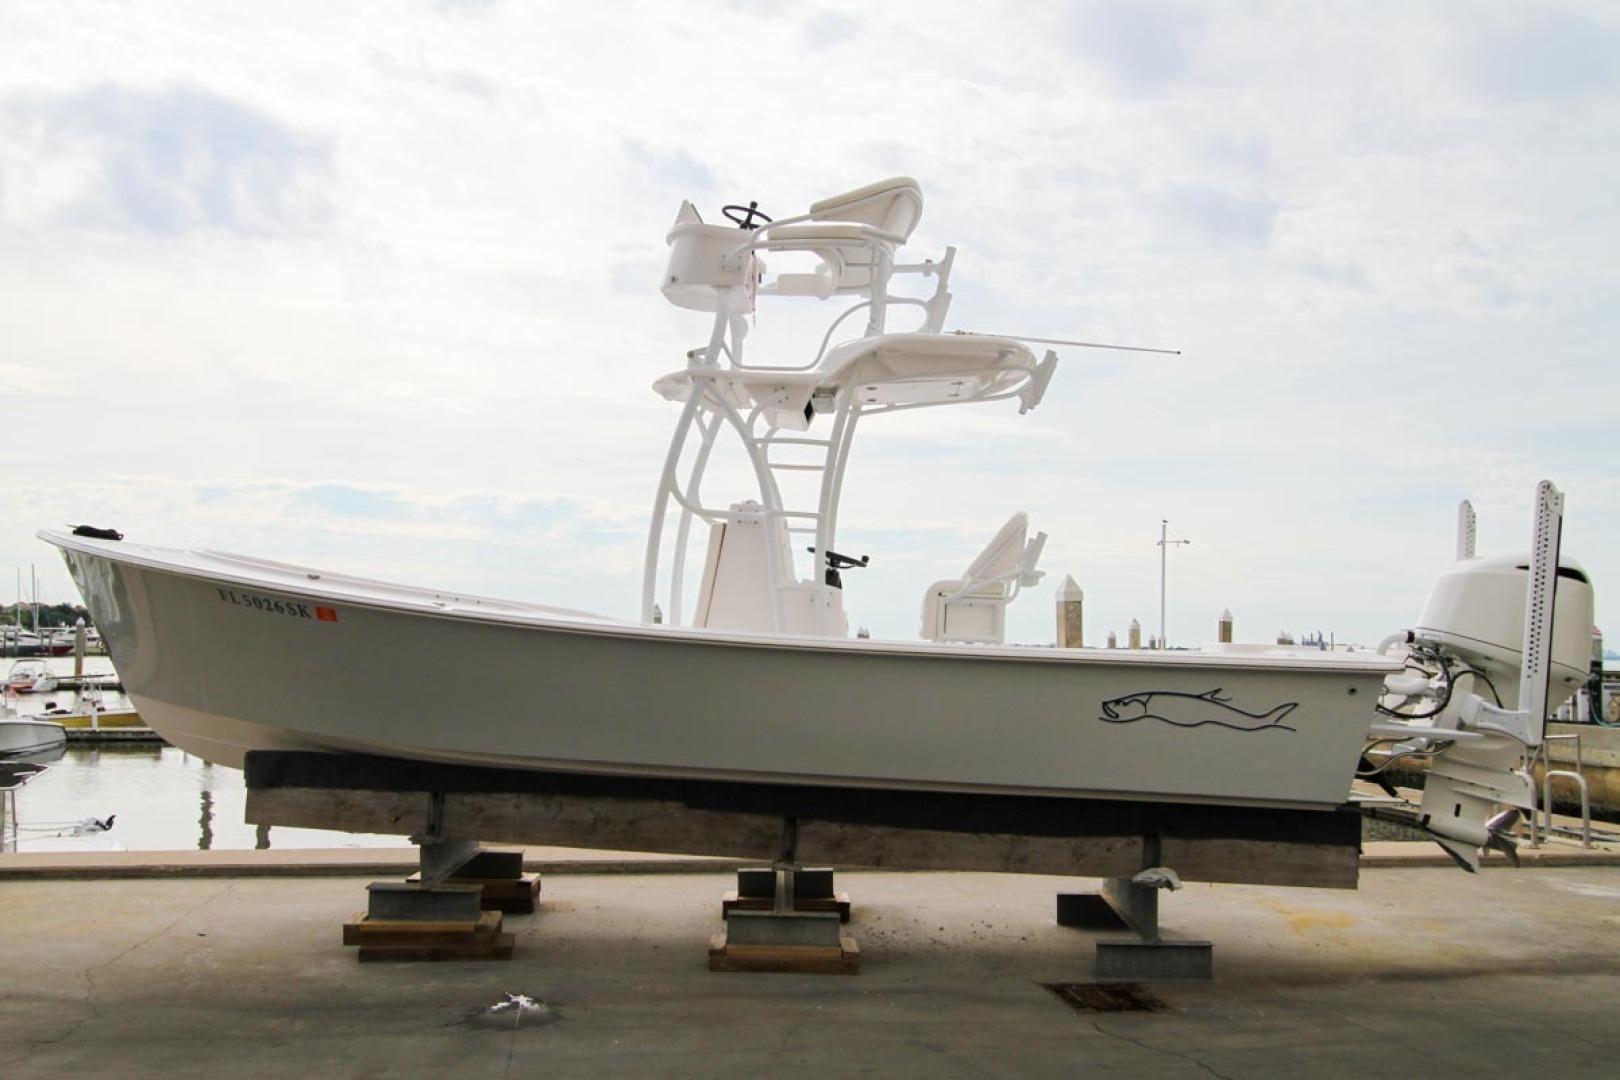 Gause Built-26 cc 2020 -Tampa-Florida-United States-Gause Built 26-1567177 | Thumbnail